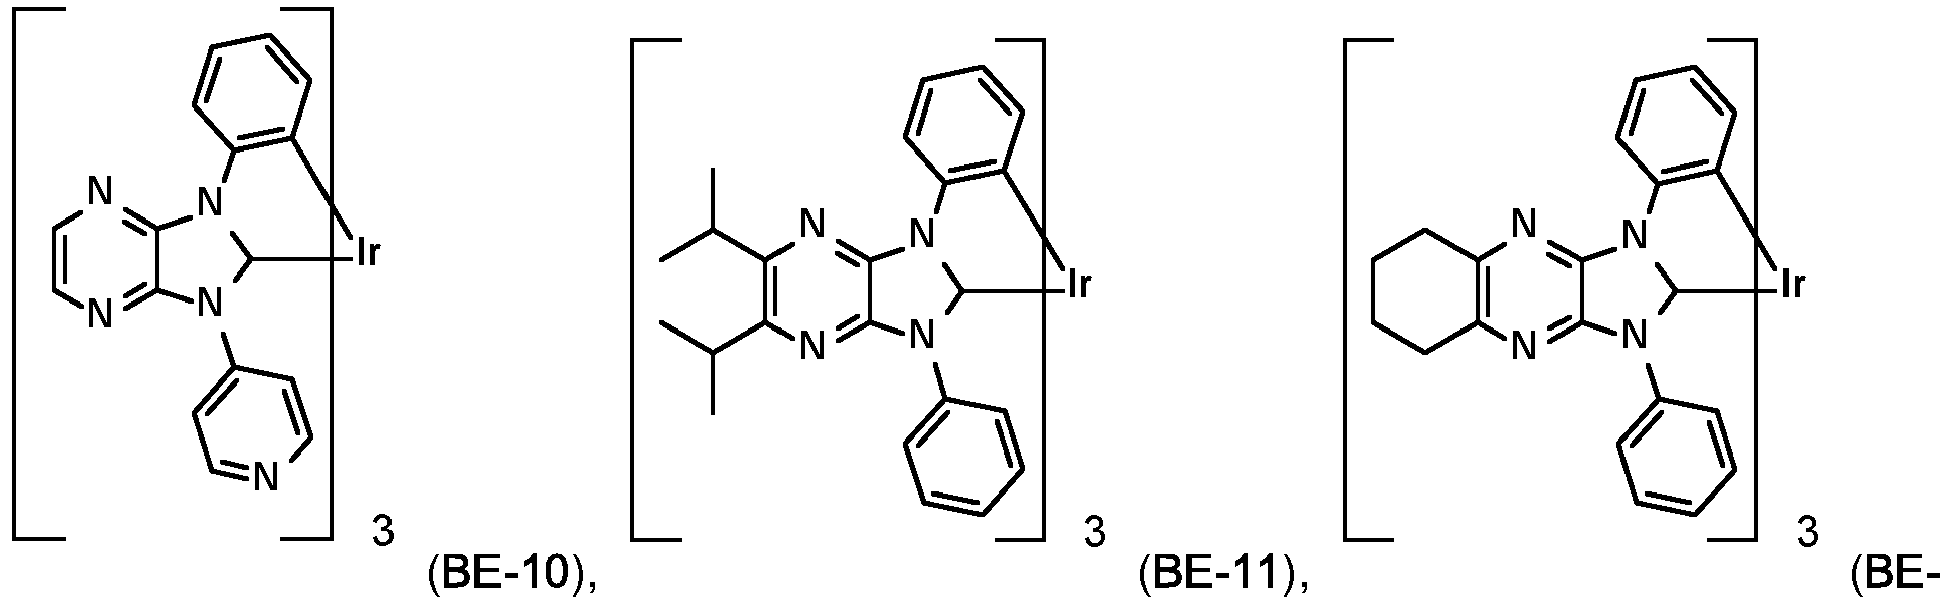 Figure imgb0755